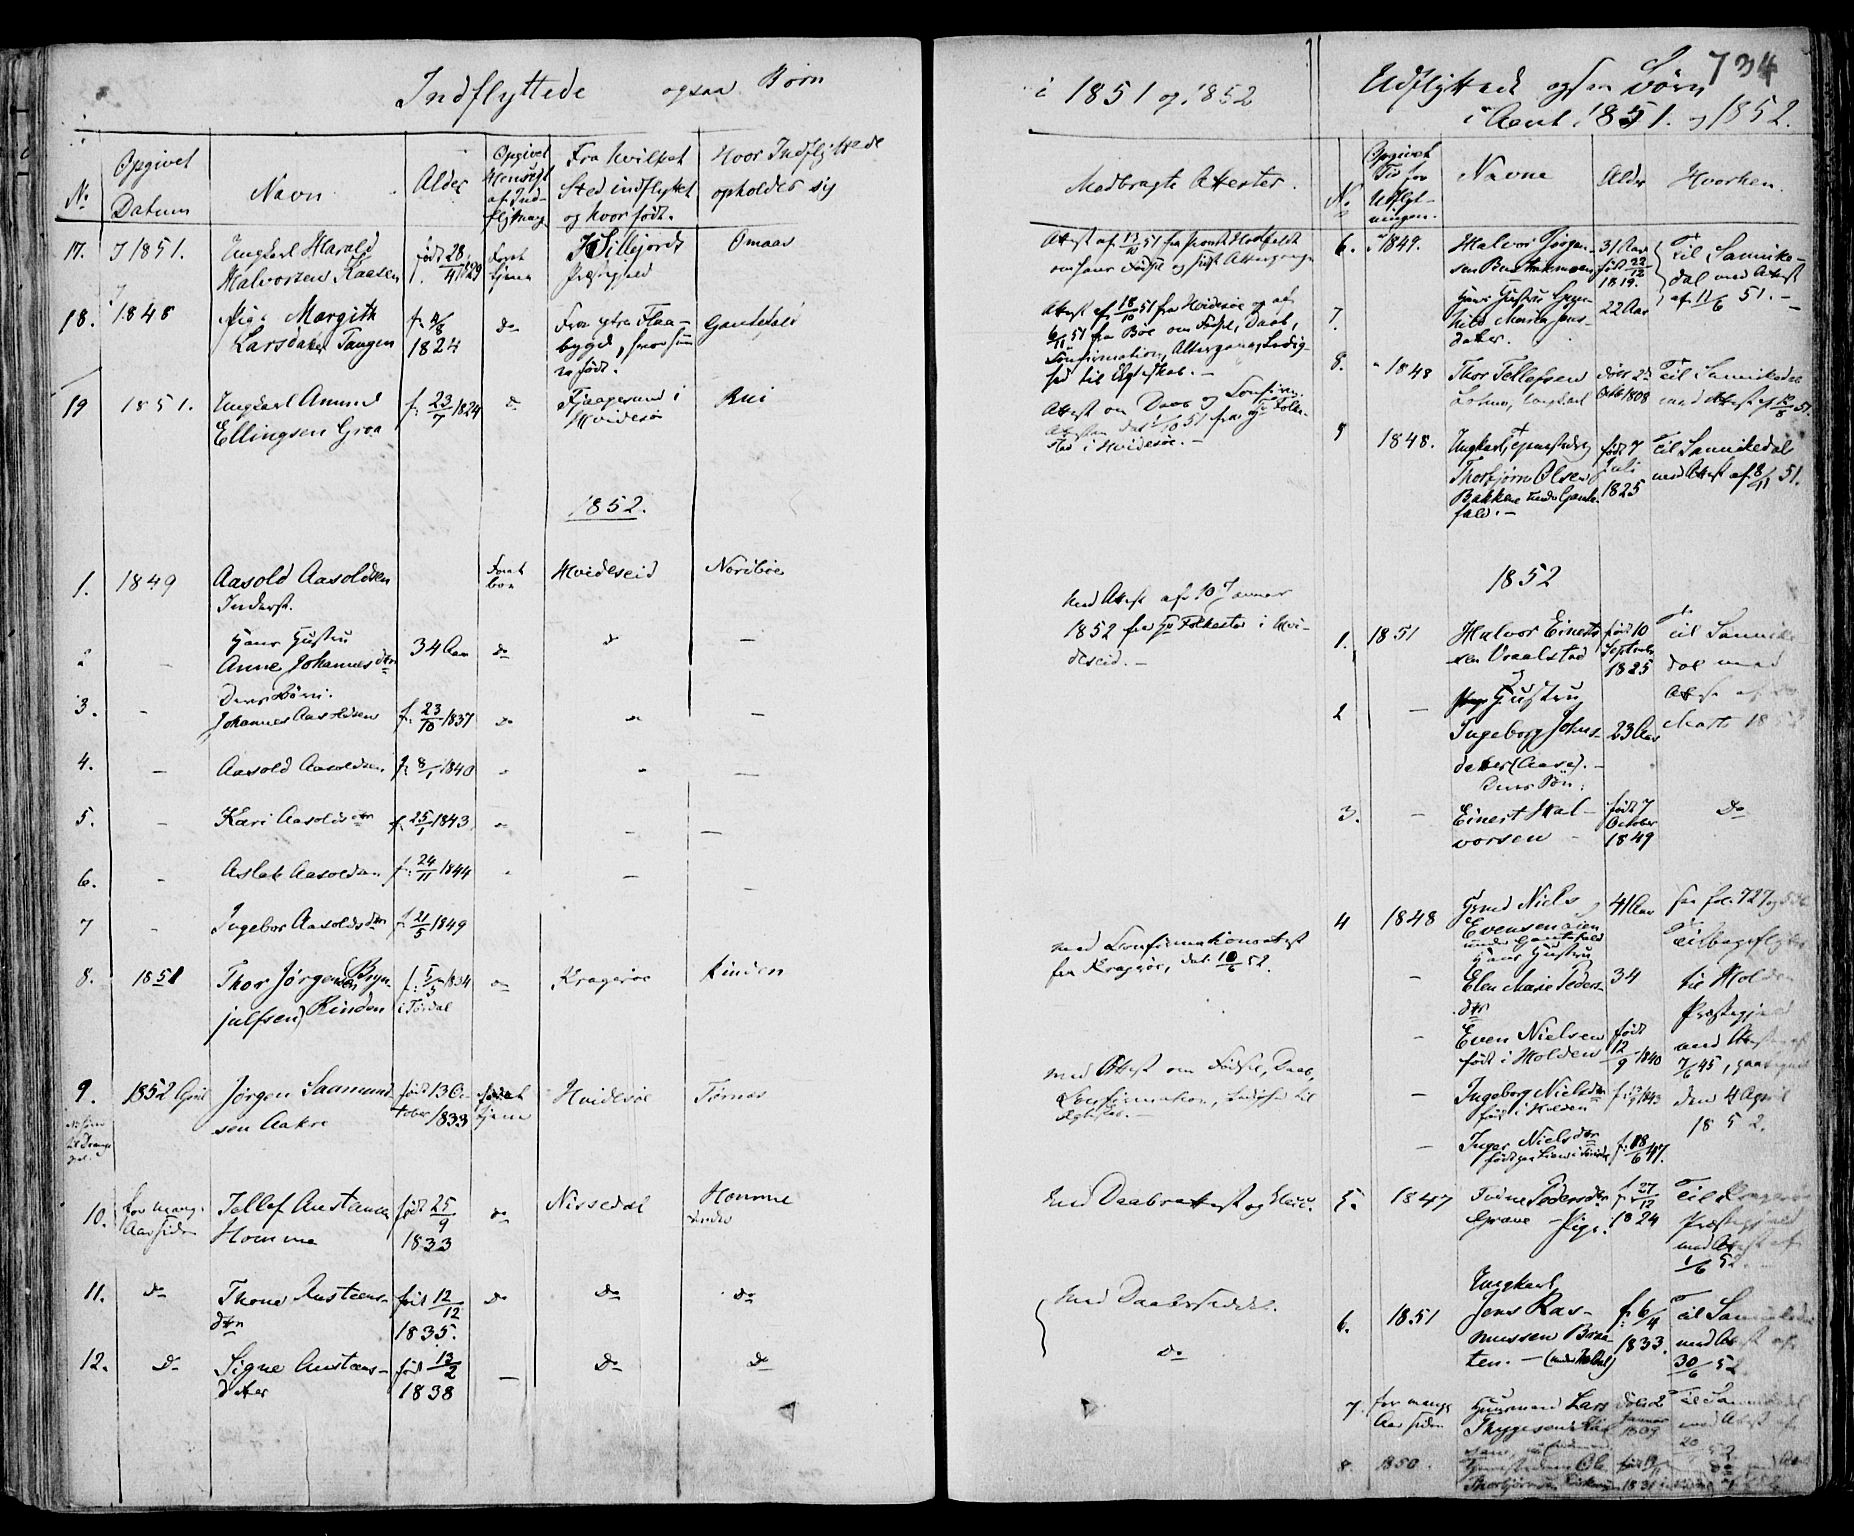 SAKO, Drangedal kirkebøker, F/Fa/L0007b: Ministerialbok nr. 7b, 1837-1856, s. 734